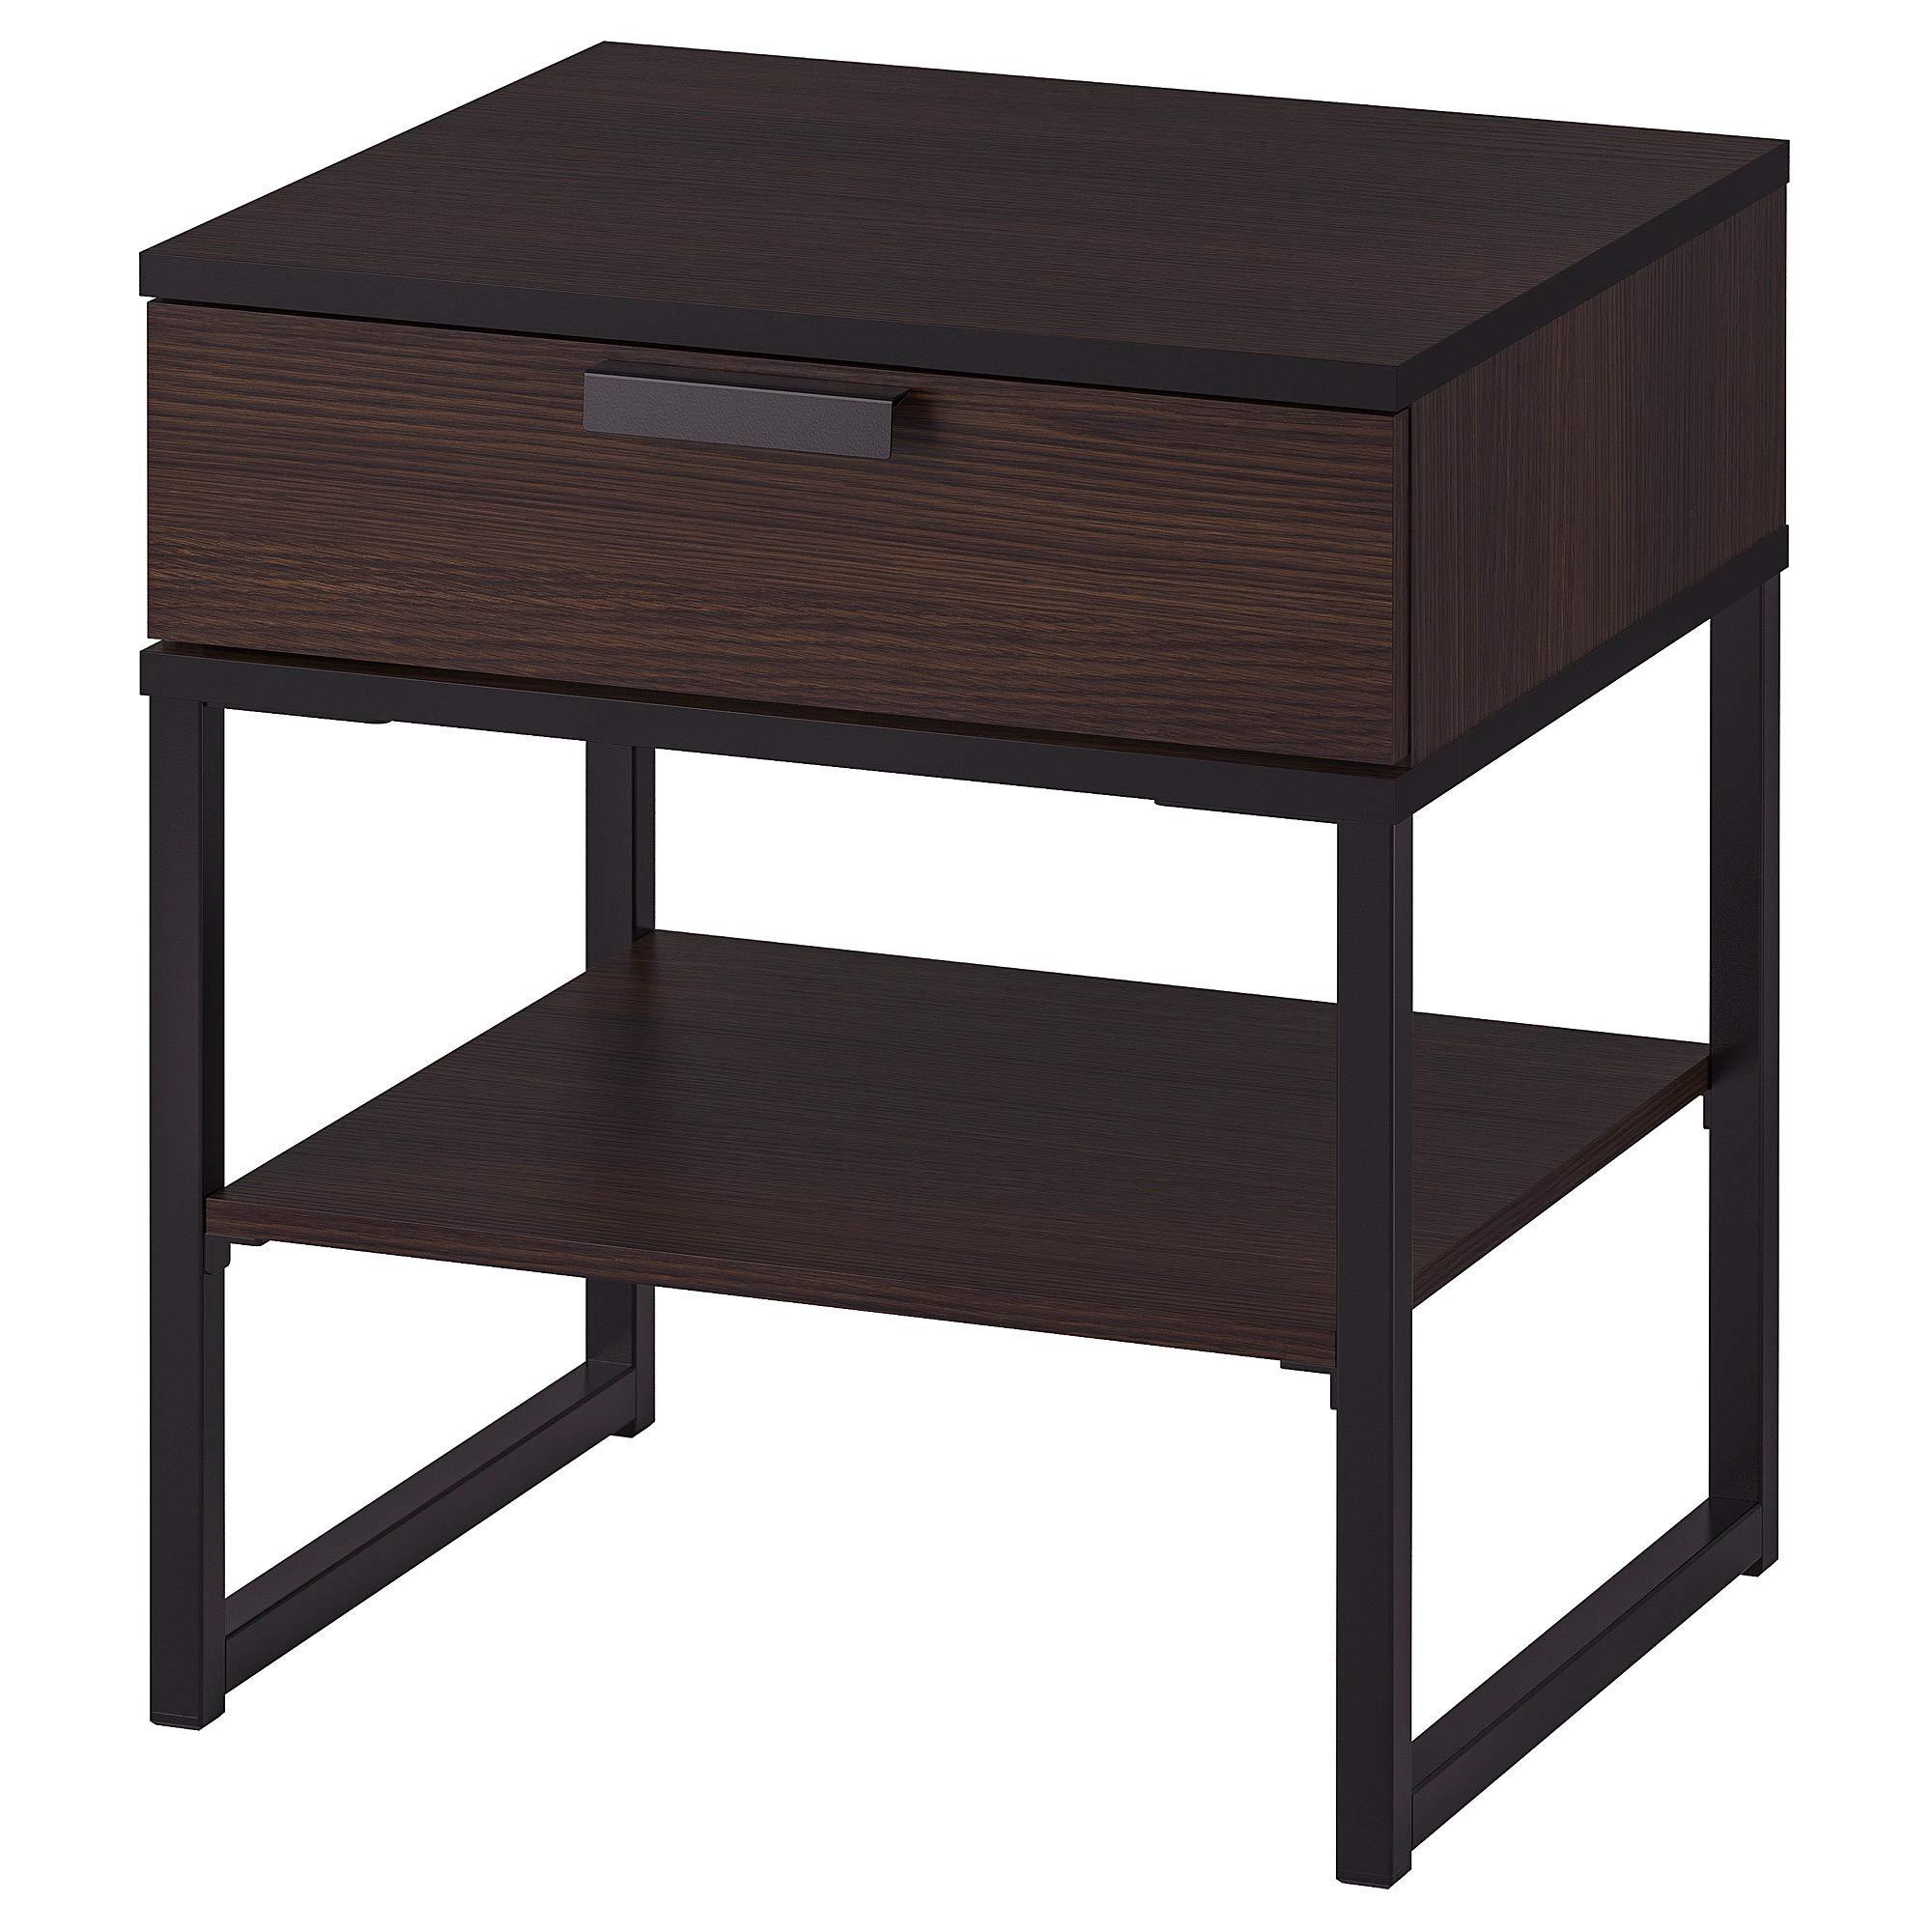 IKEA.. 602.360.24 Trysil Nightstand, Dark Brown, Black by IKEA..